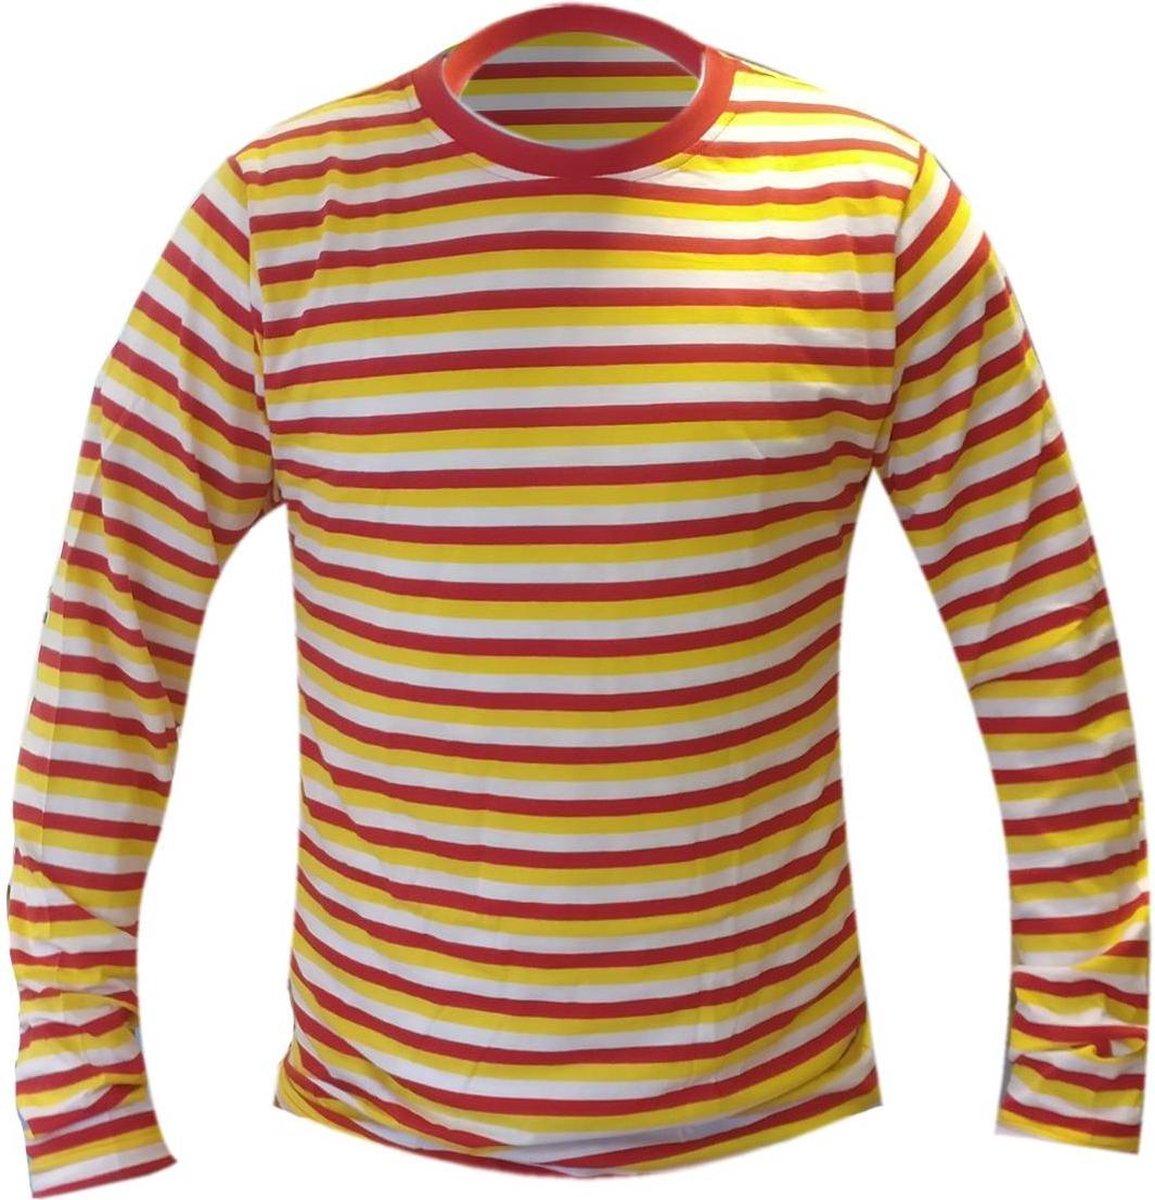 Carnavalskleding: Dorus trui (diverse kleuren)